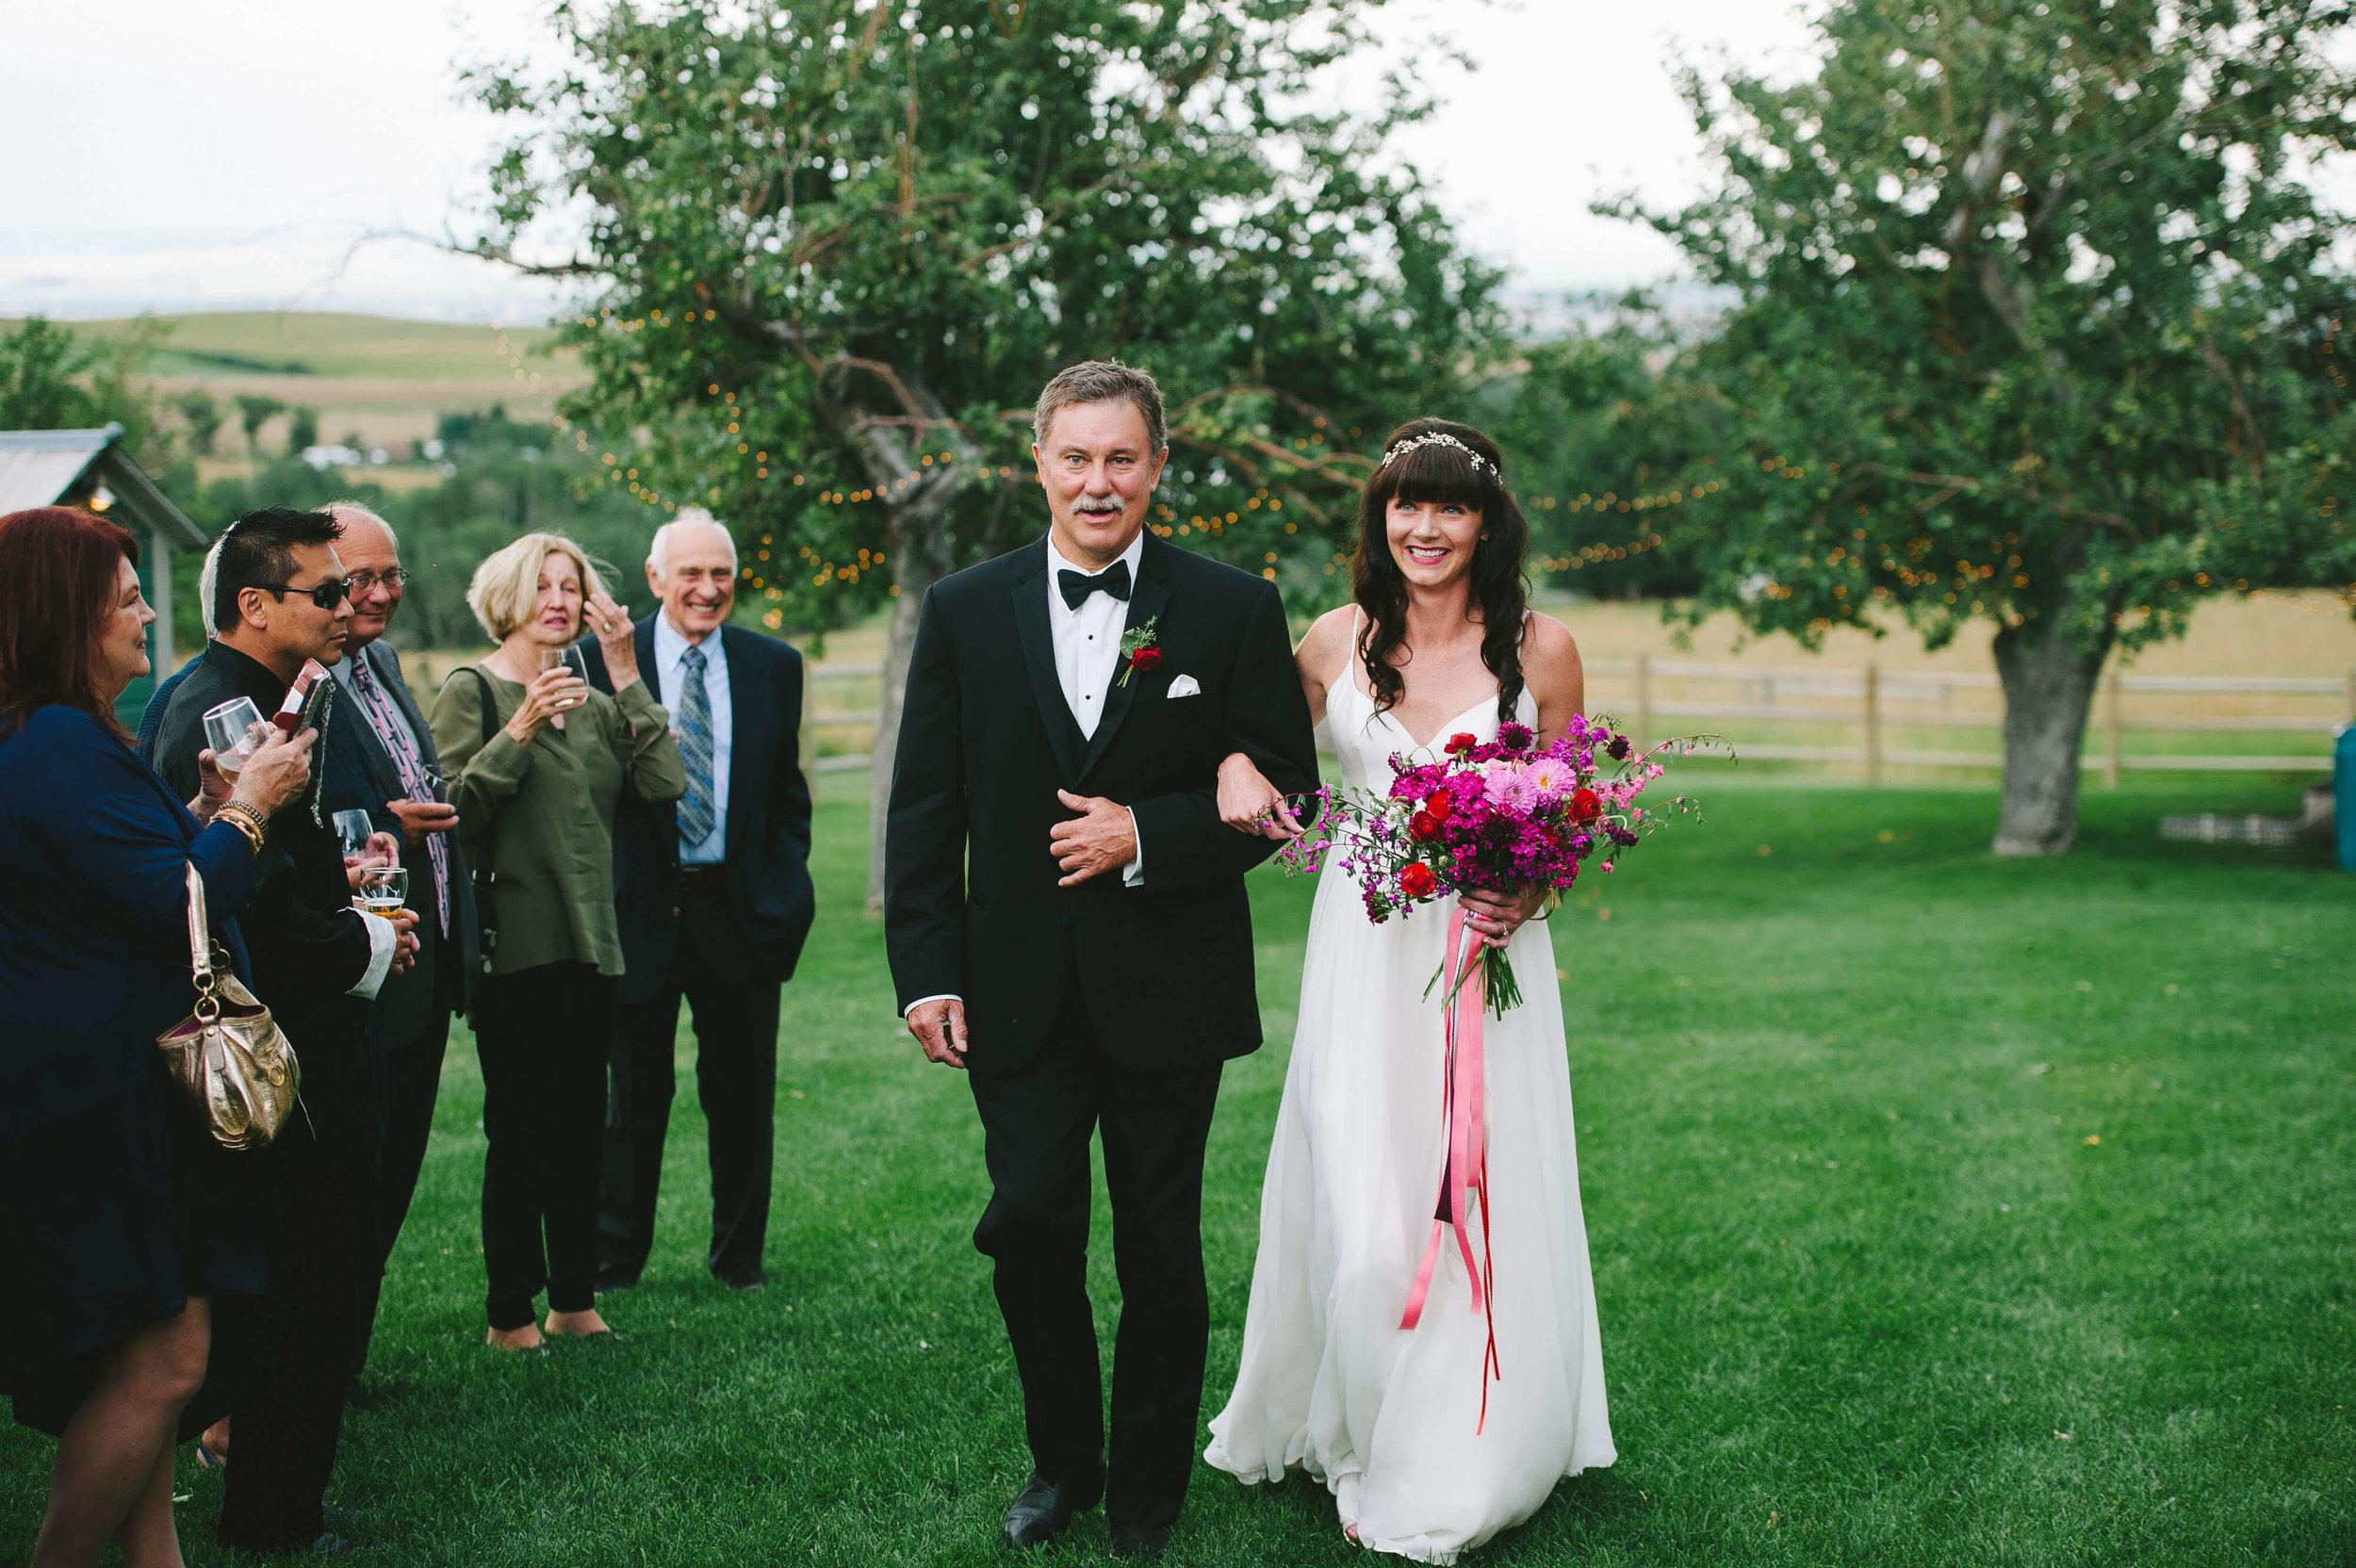 engle-olson-fran-ze-photo-montana-wedding-73.jpg